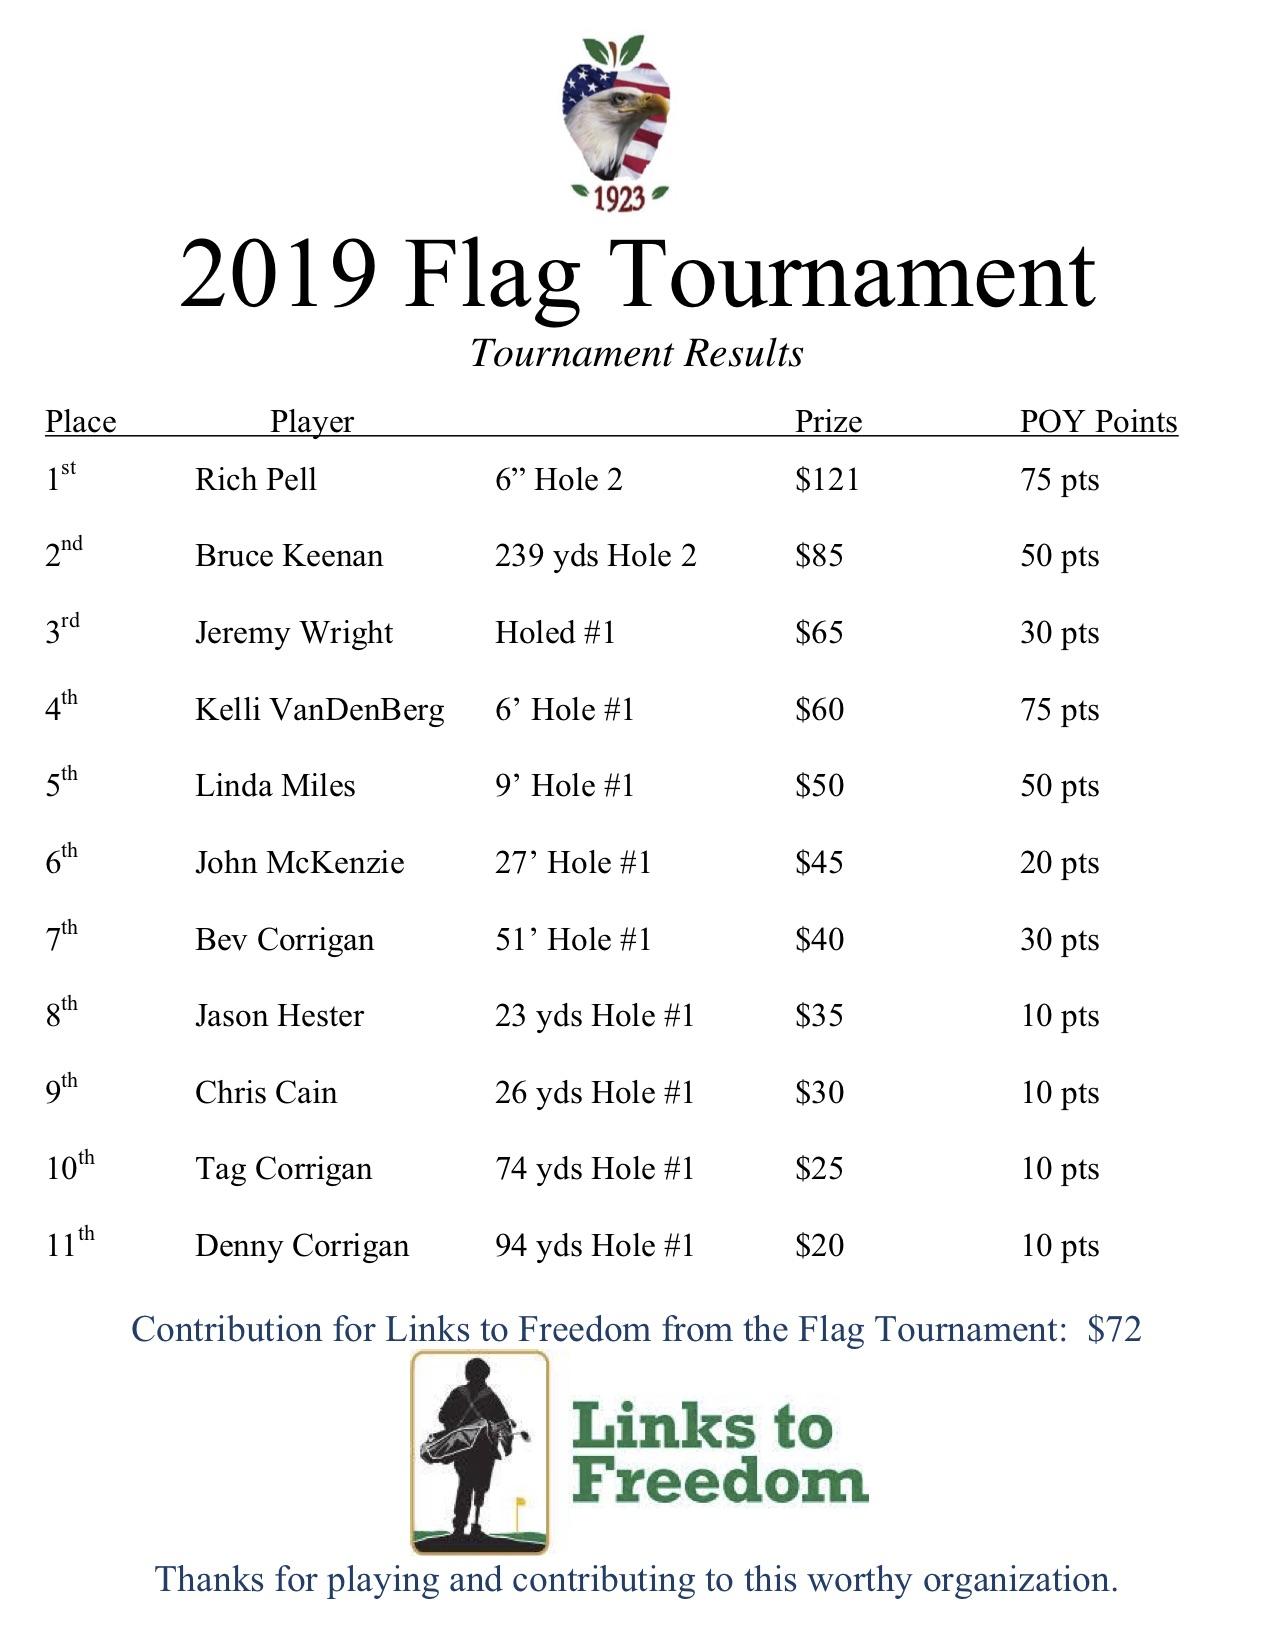 2019 flag tournament results.jpg